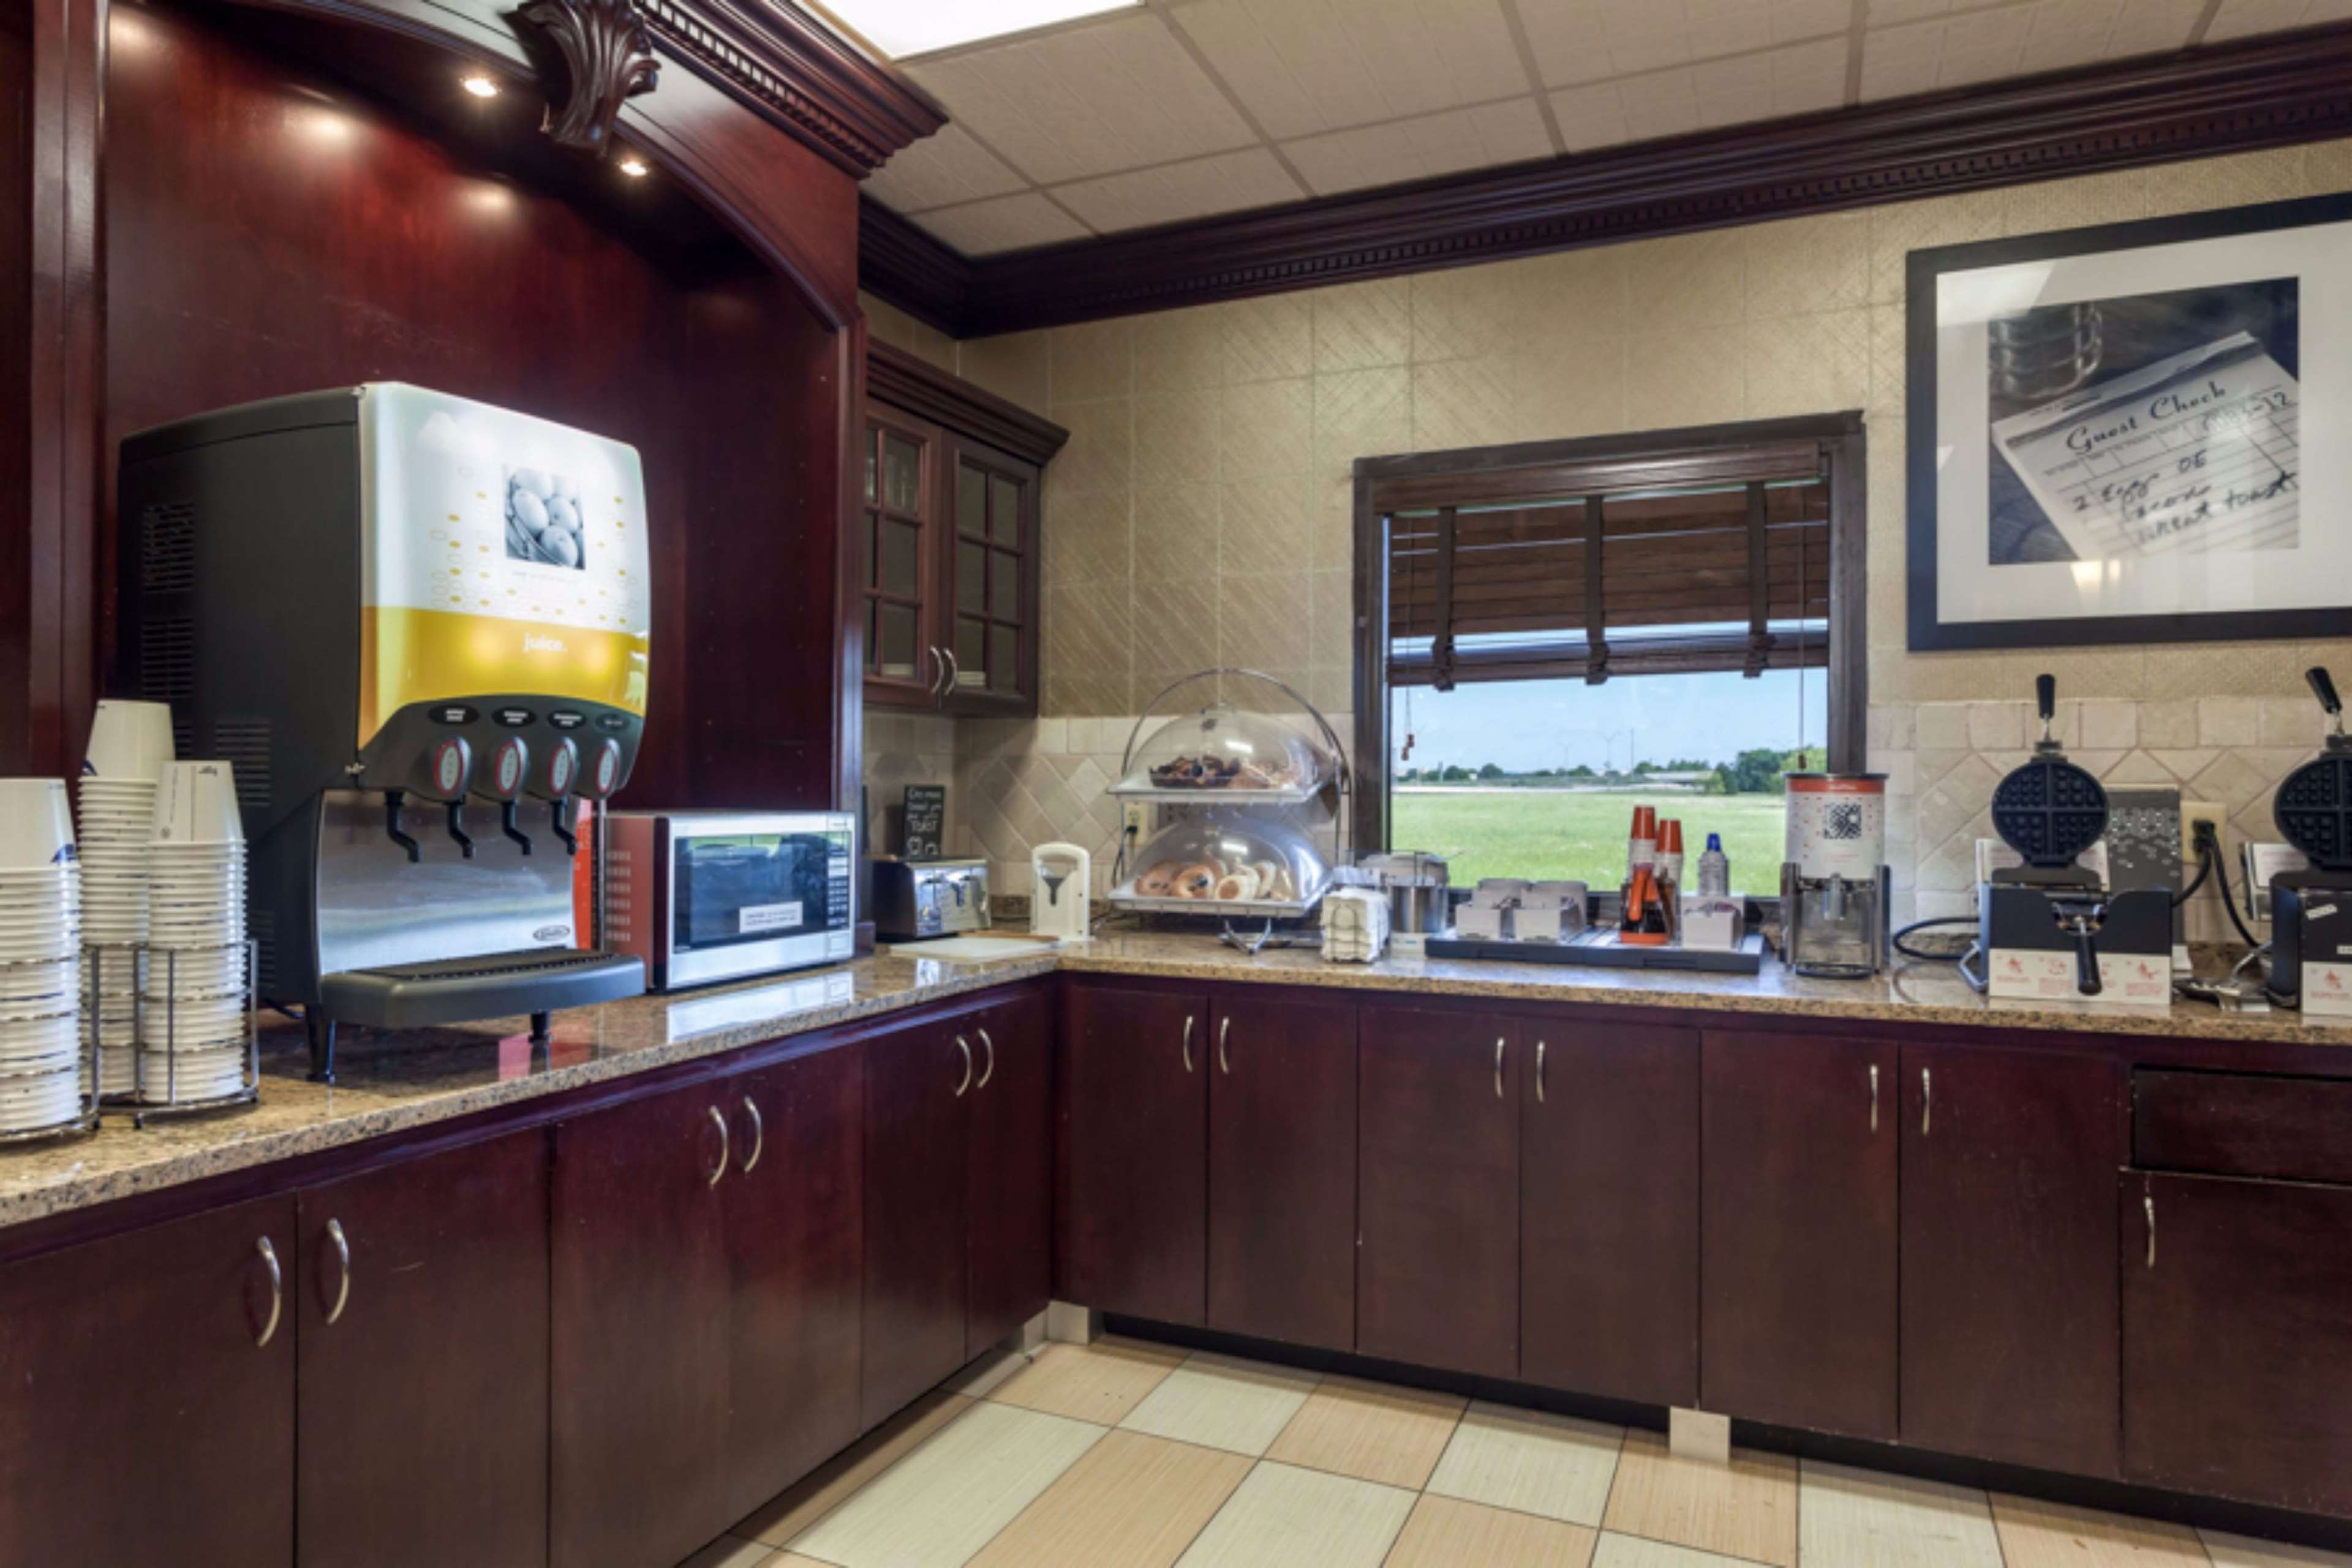 Hampton Inn & Suites Dallas-DFW Airport North-Grapevine image 9